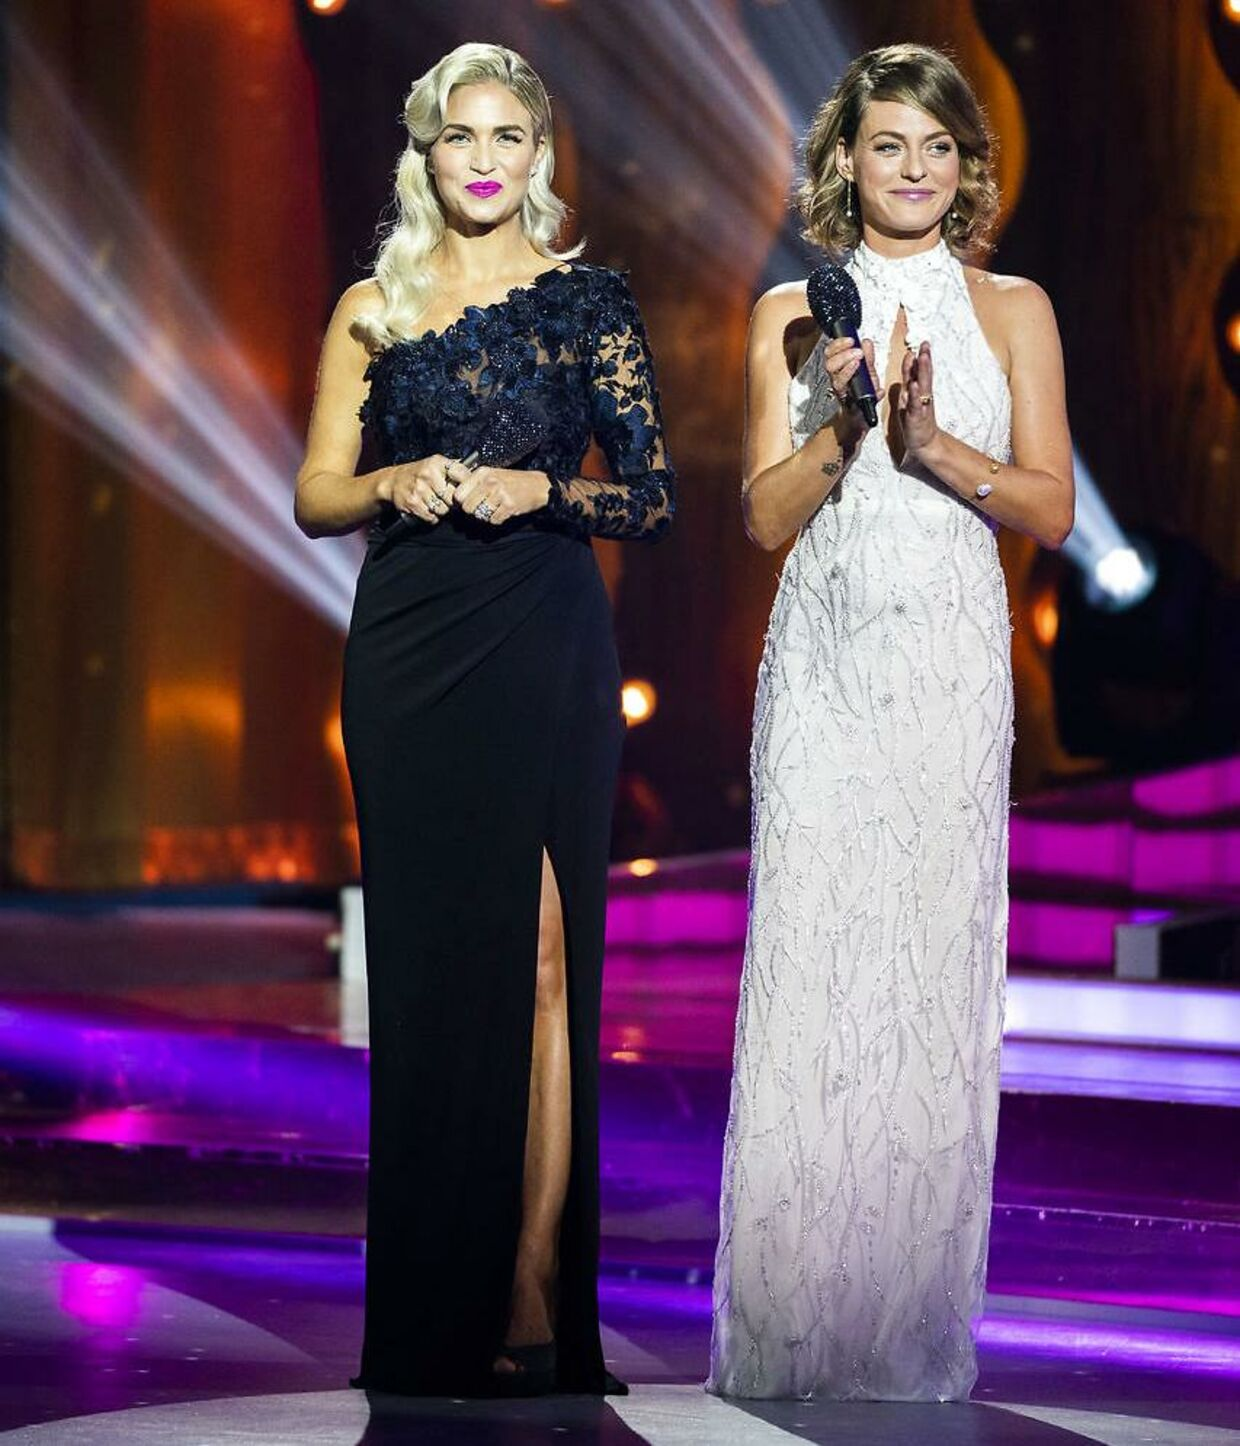 Årets 'Vild med dans'-værter Sarah Grünewald og Christiane Schaumburg-Müller.